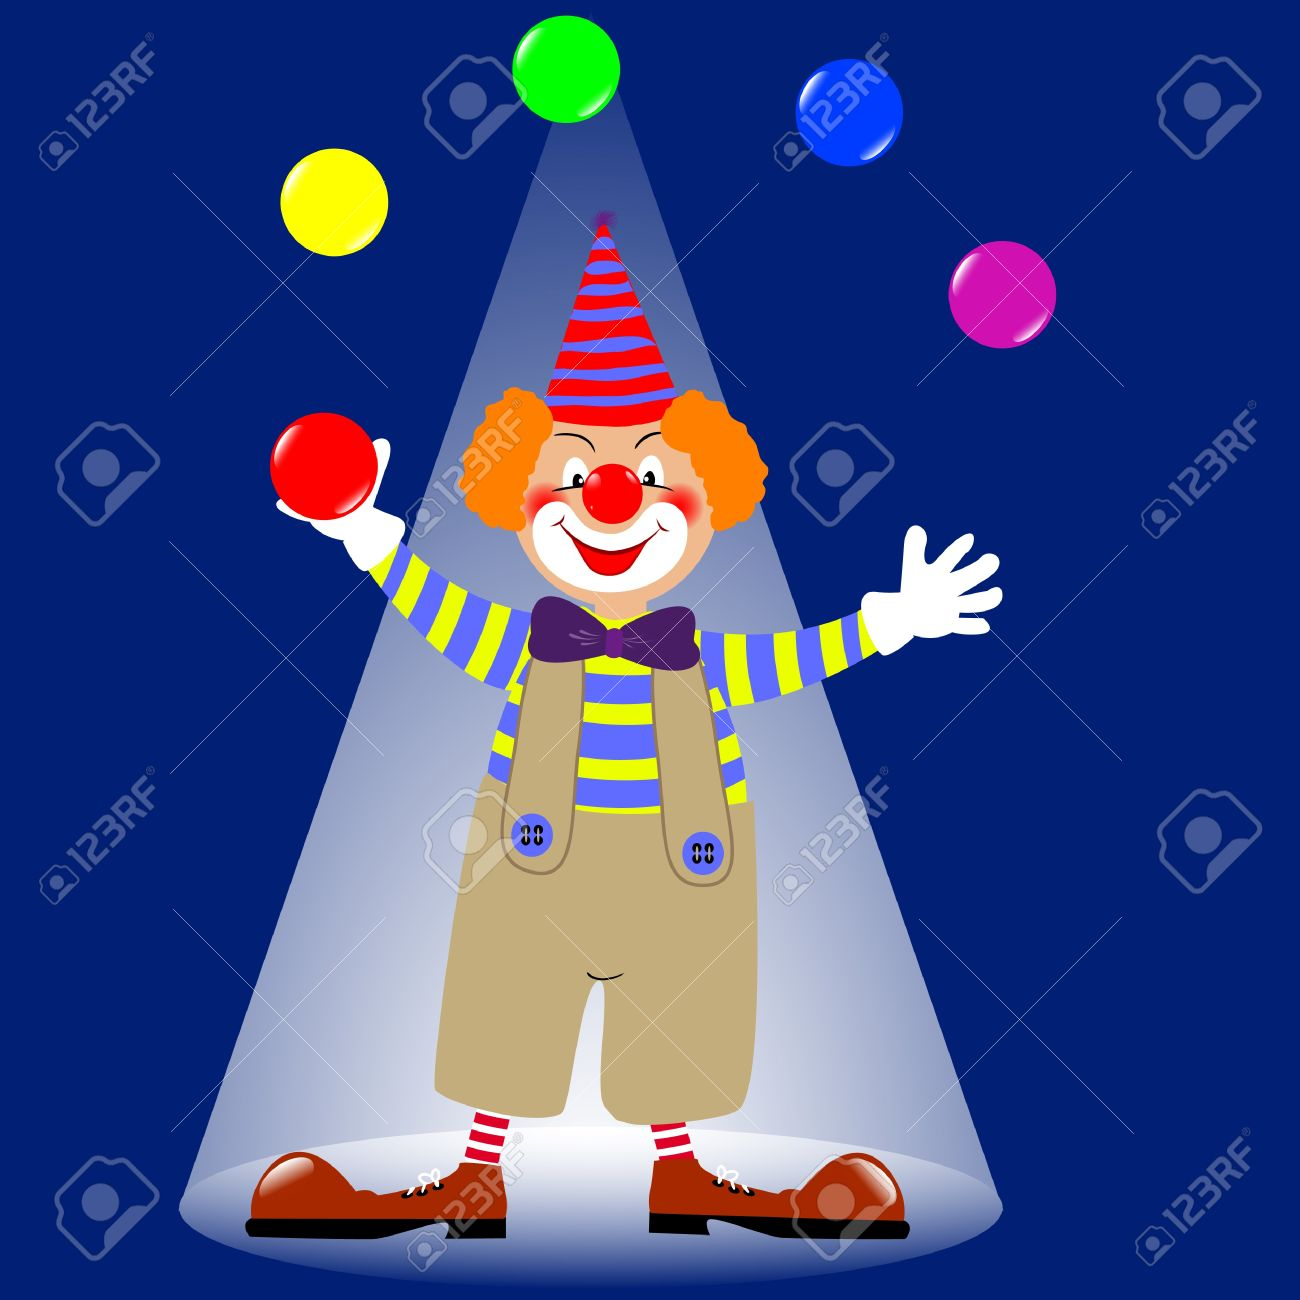 A clown juggling colorful balls Stock Vector - 14437909